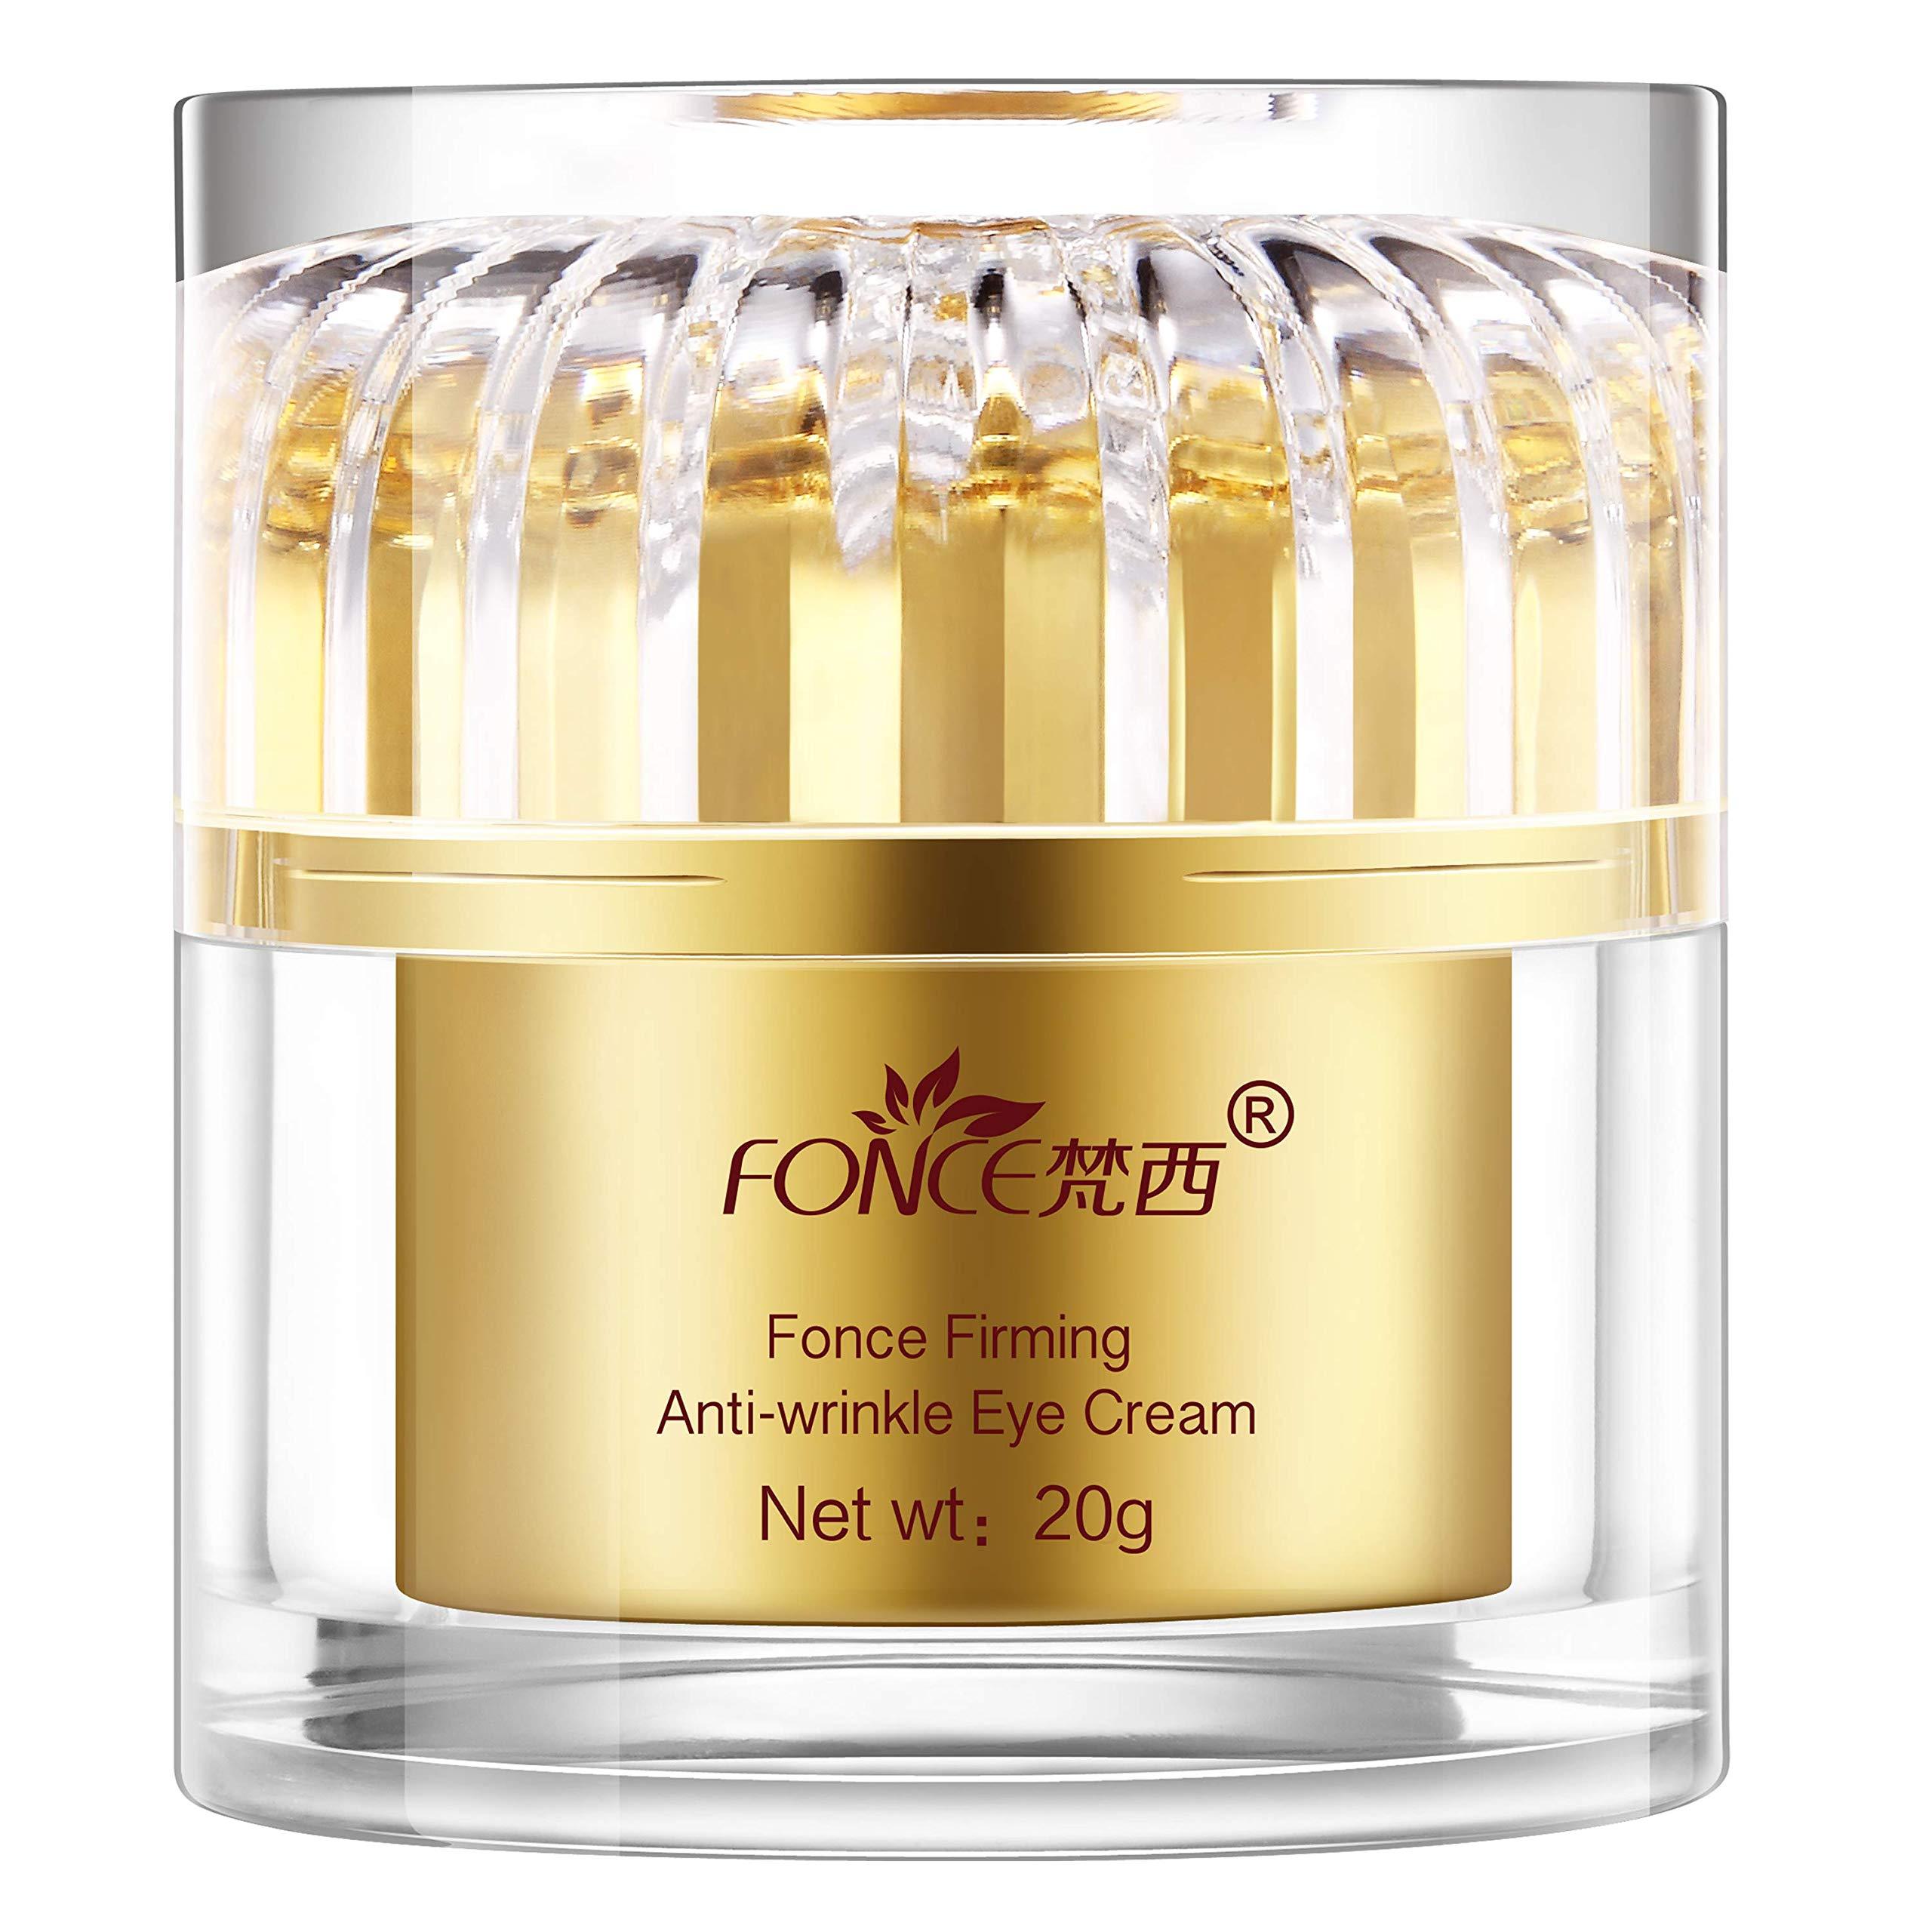 Fonce Retinol Moisturizer Cream for Eye Area,BEST Korean Eye Cream Anti-Wrinkle&Fine Line Anti-Aging Fade Wrinkles Plant Extract Tighten Skin Eye Cream for Men&Women